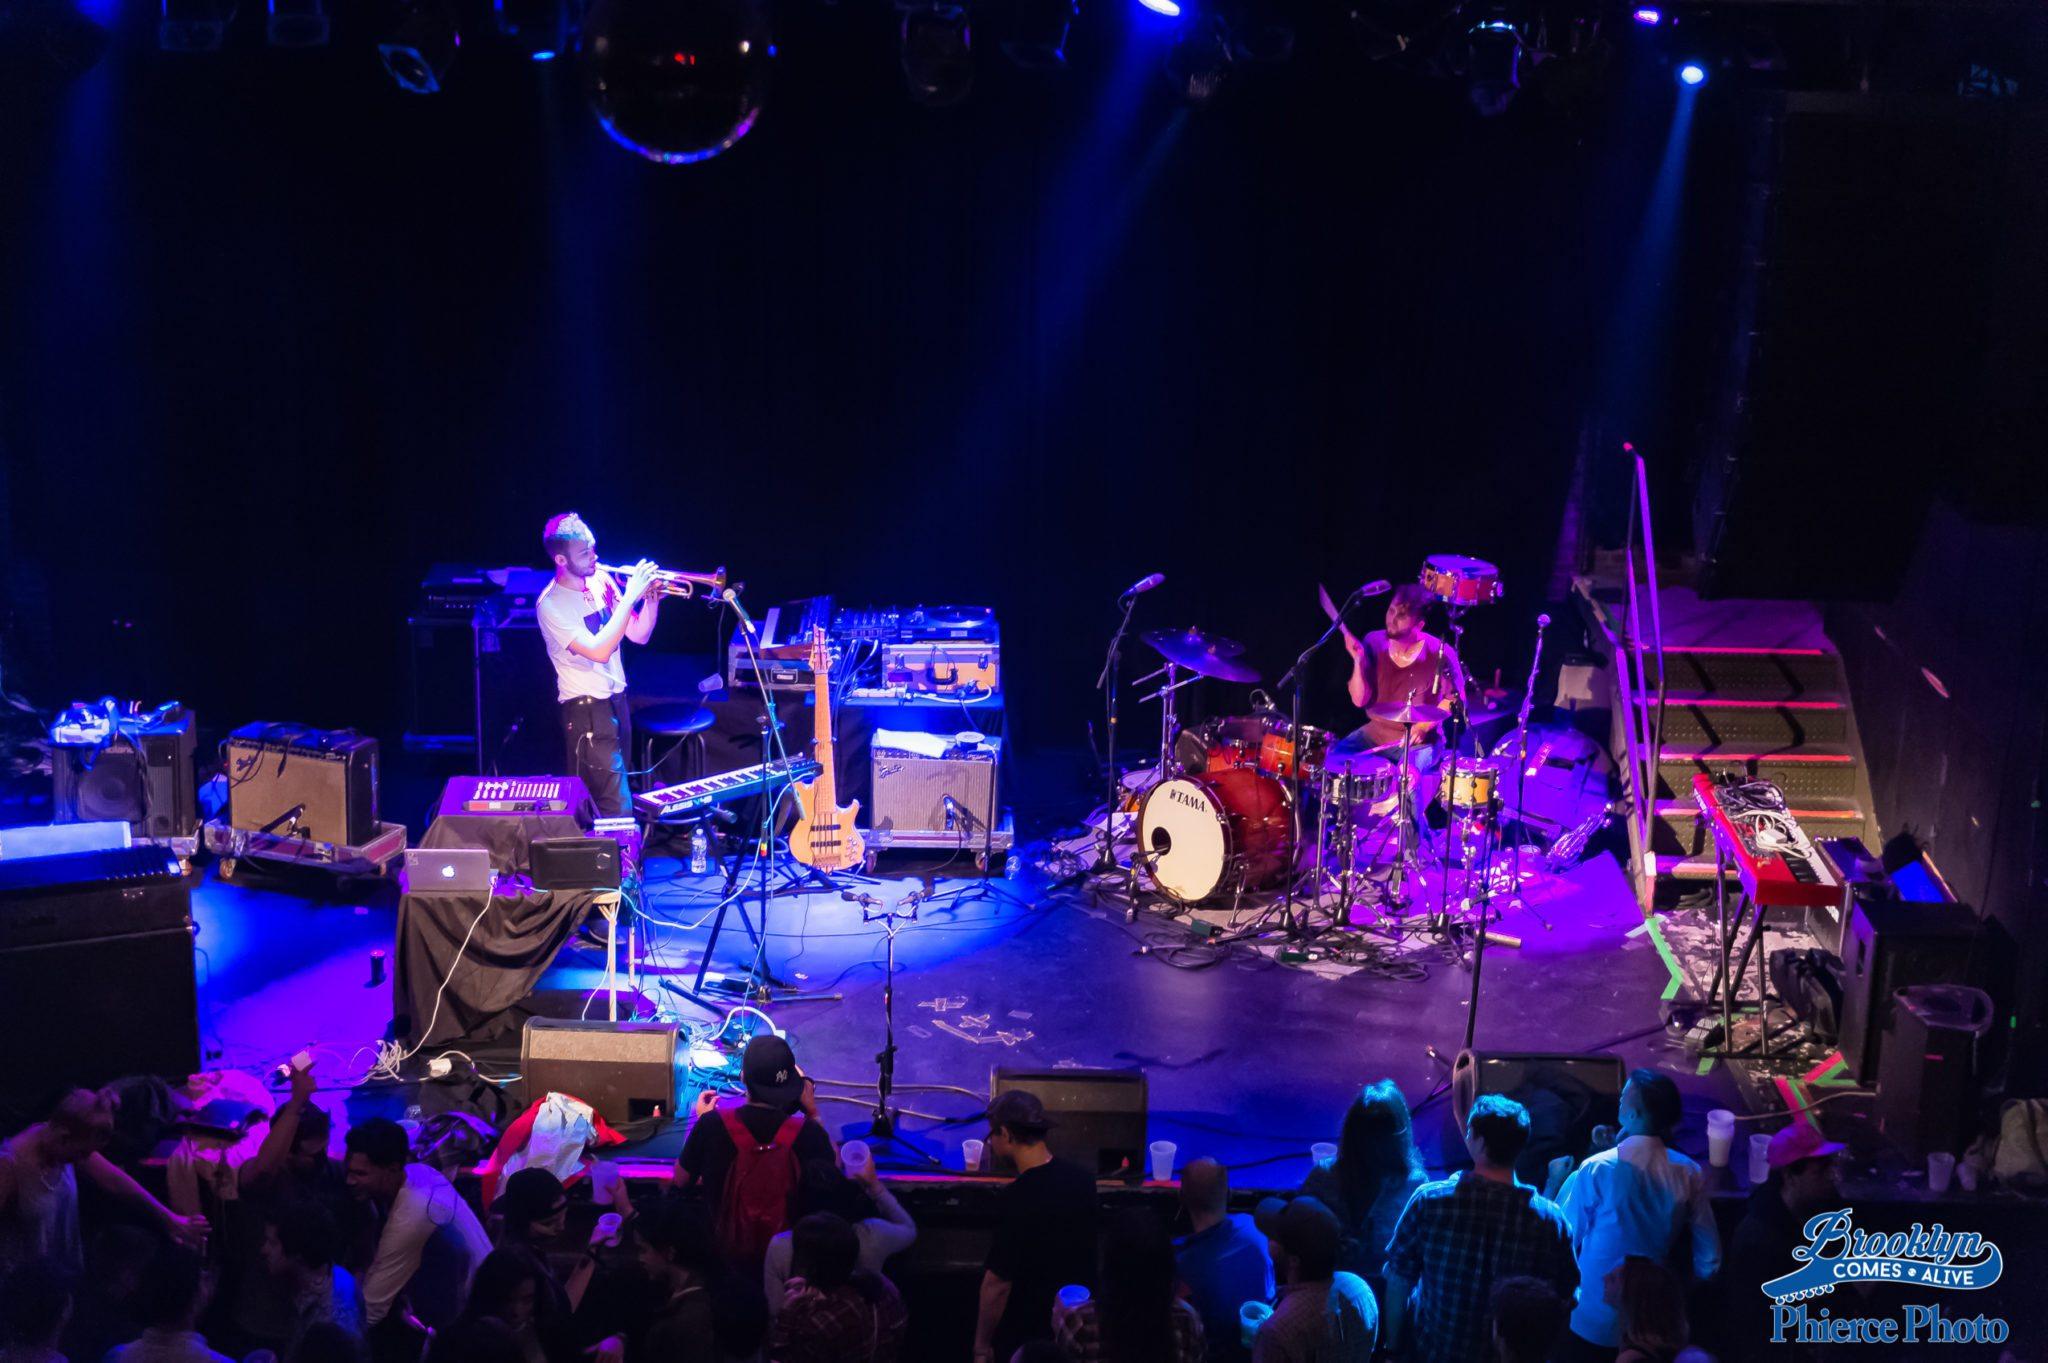 bca-basstracks-nyc-oct-22-2016_phierce-photo-_prc0124-edit